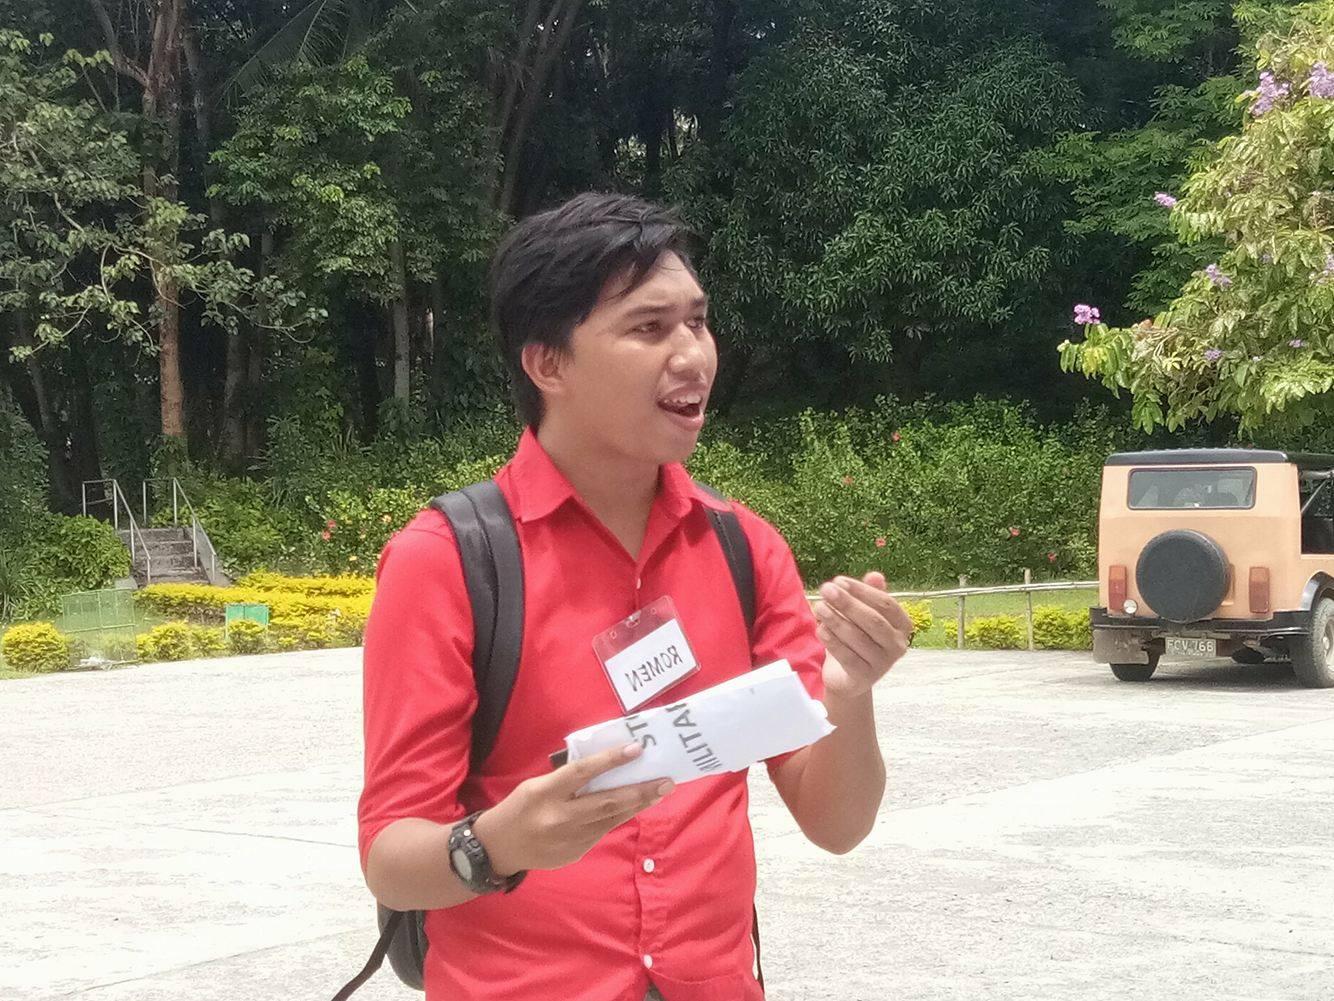 Romen Wabina of the UP Mindanao Student Council (Photo by Daniel Boone/Bulatlat)